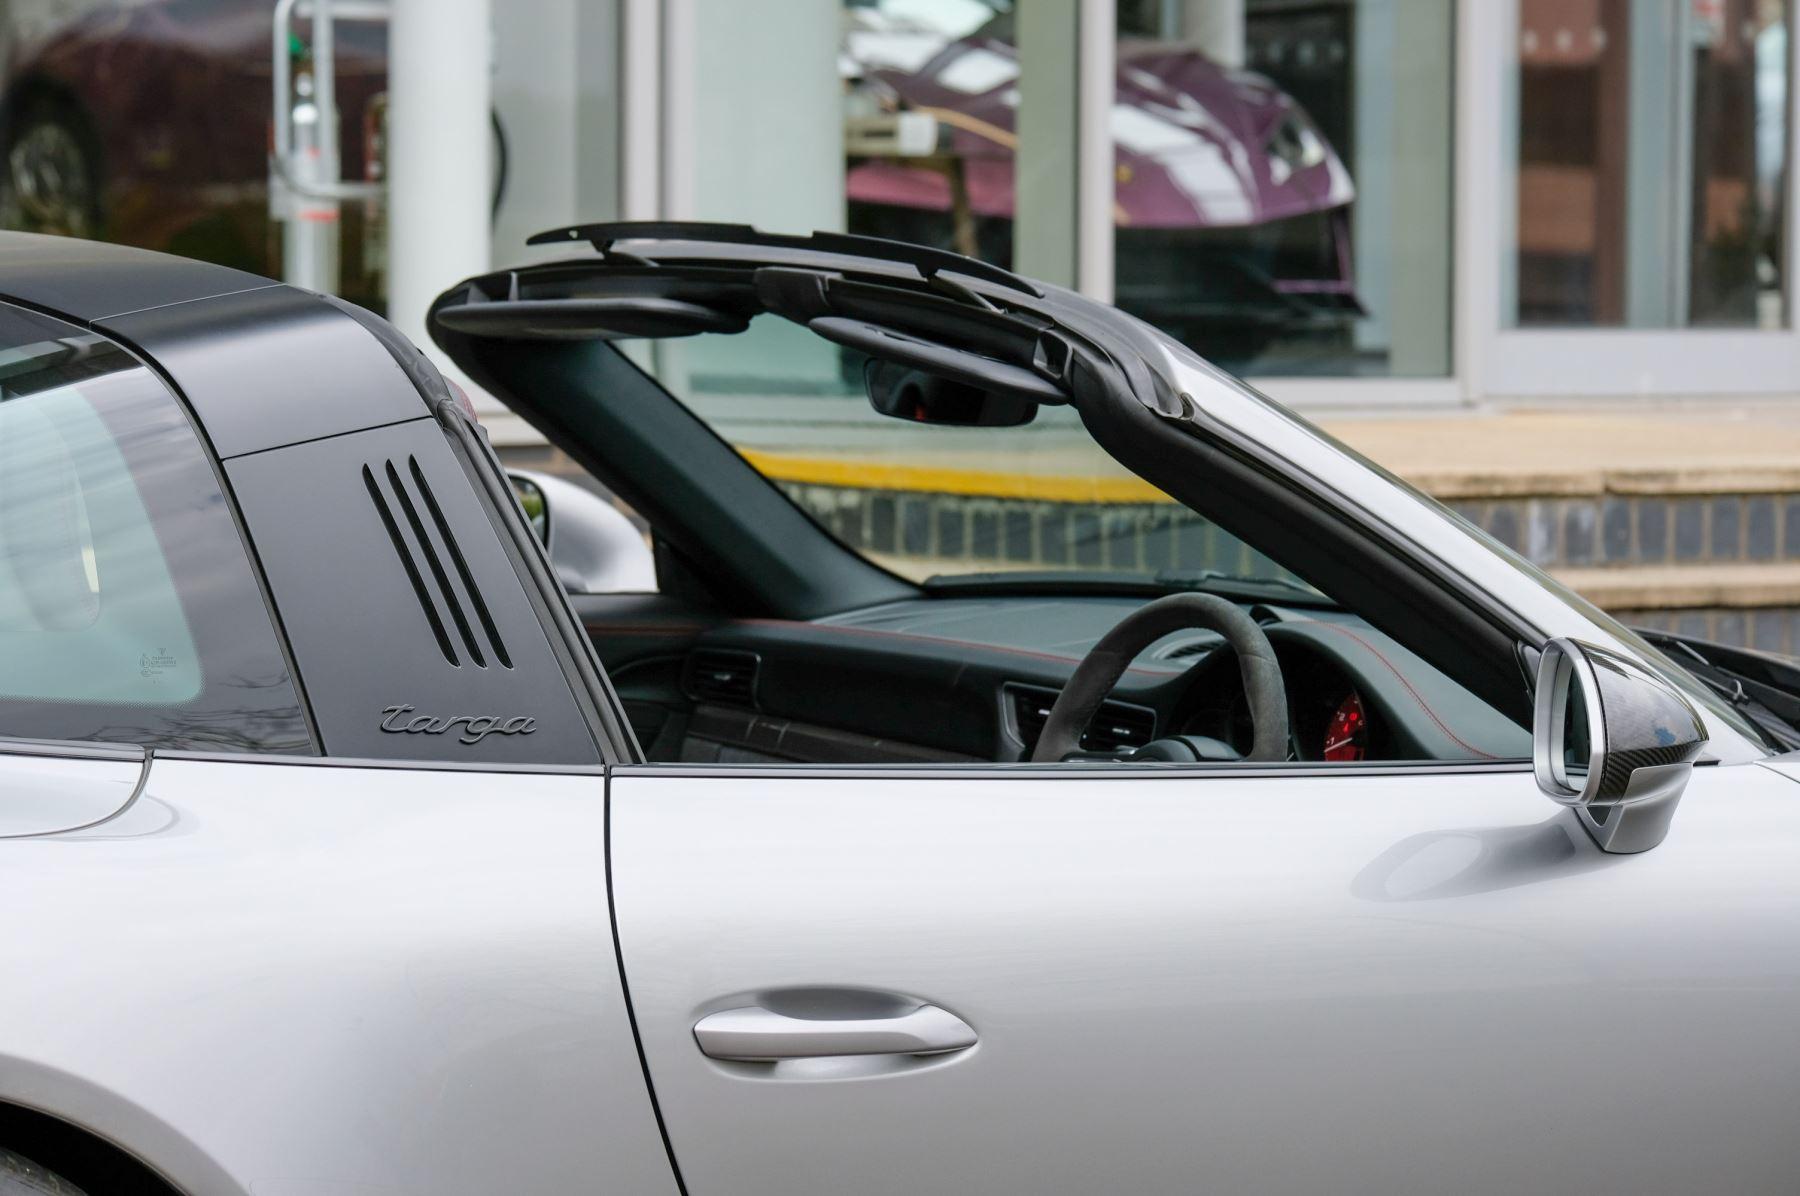 Porsche 911 TARGA 4 GTS - PDK - SPORT DESIGN PACKAGE - GTS INTERIOR PACKAGE image 11